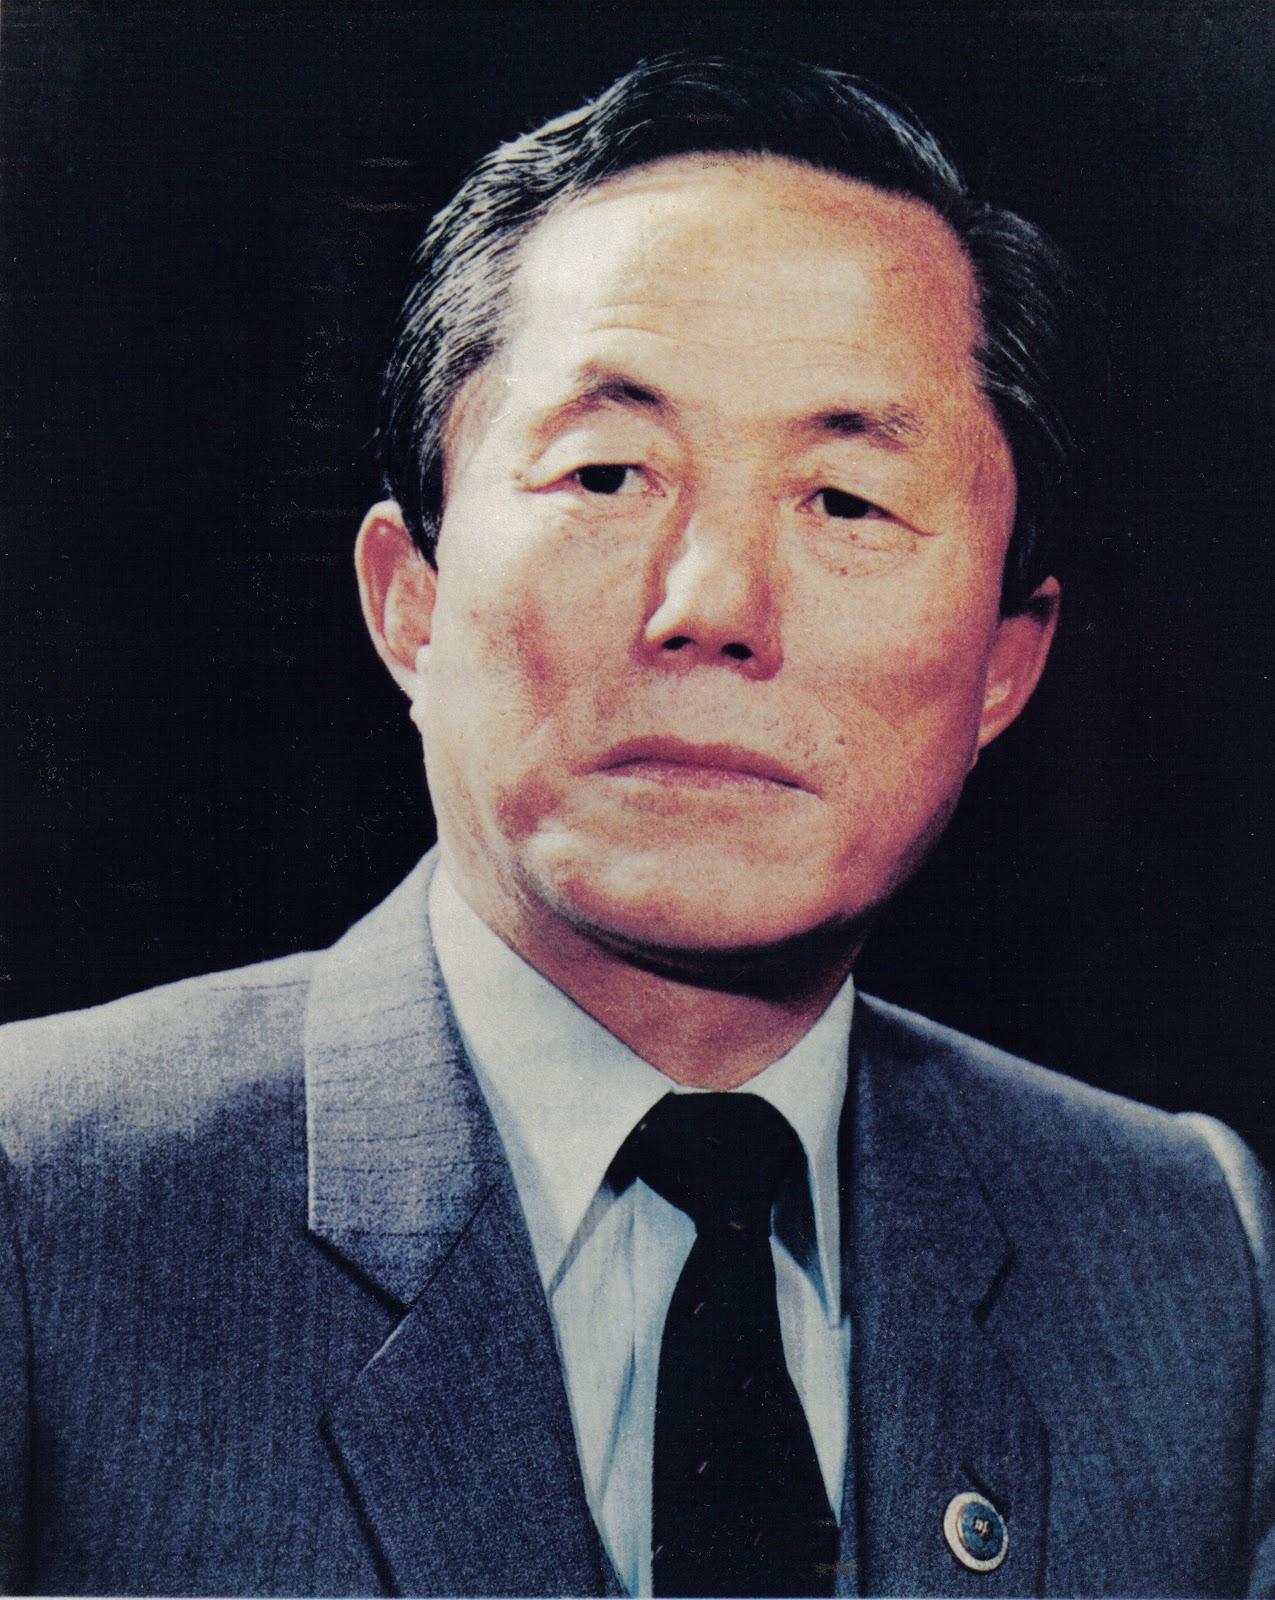 Choi Hon